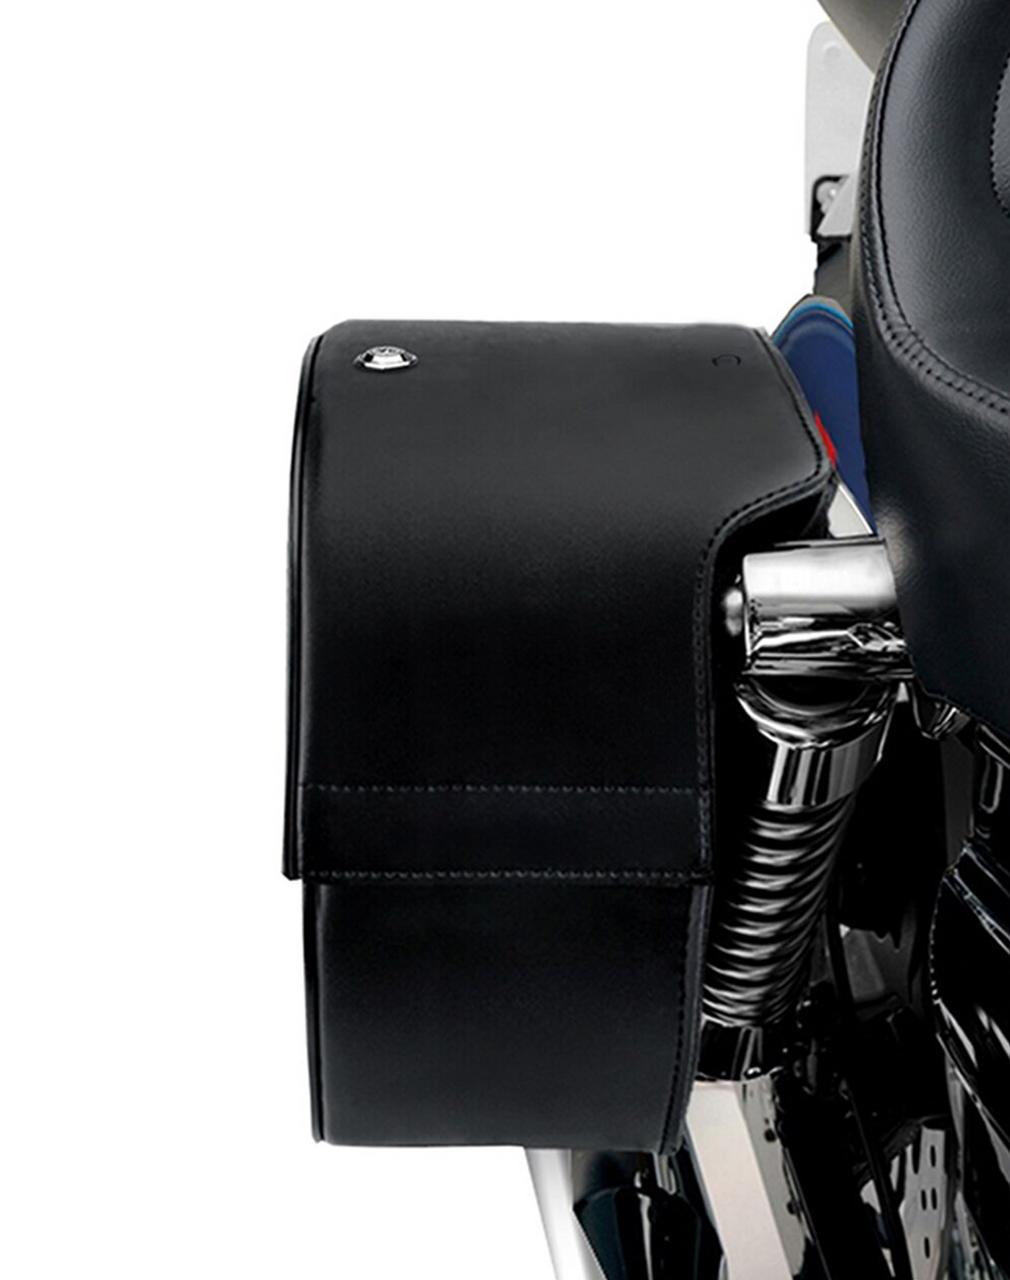 Kawasaki Eliminator 125 Shock Cutout Slanted SS Large Motorcycle Saddlebags  Shock Cutout View